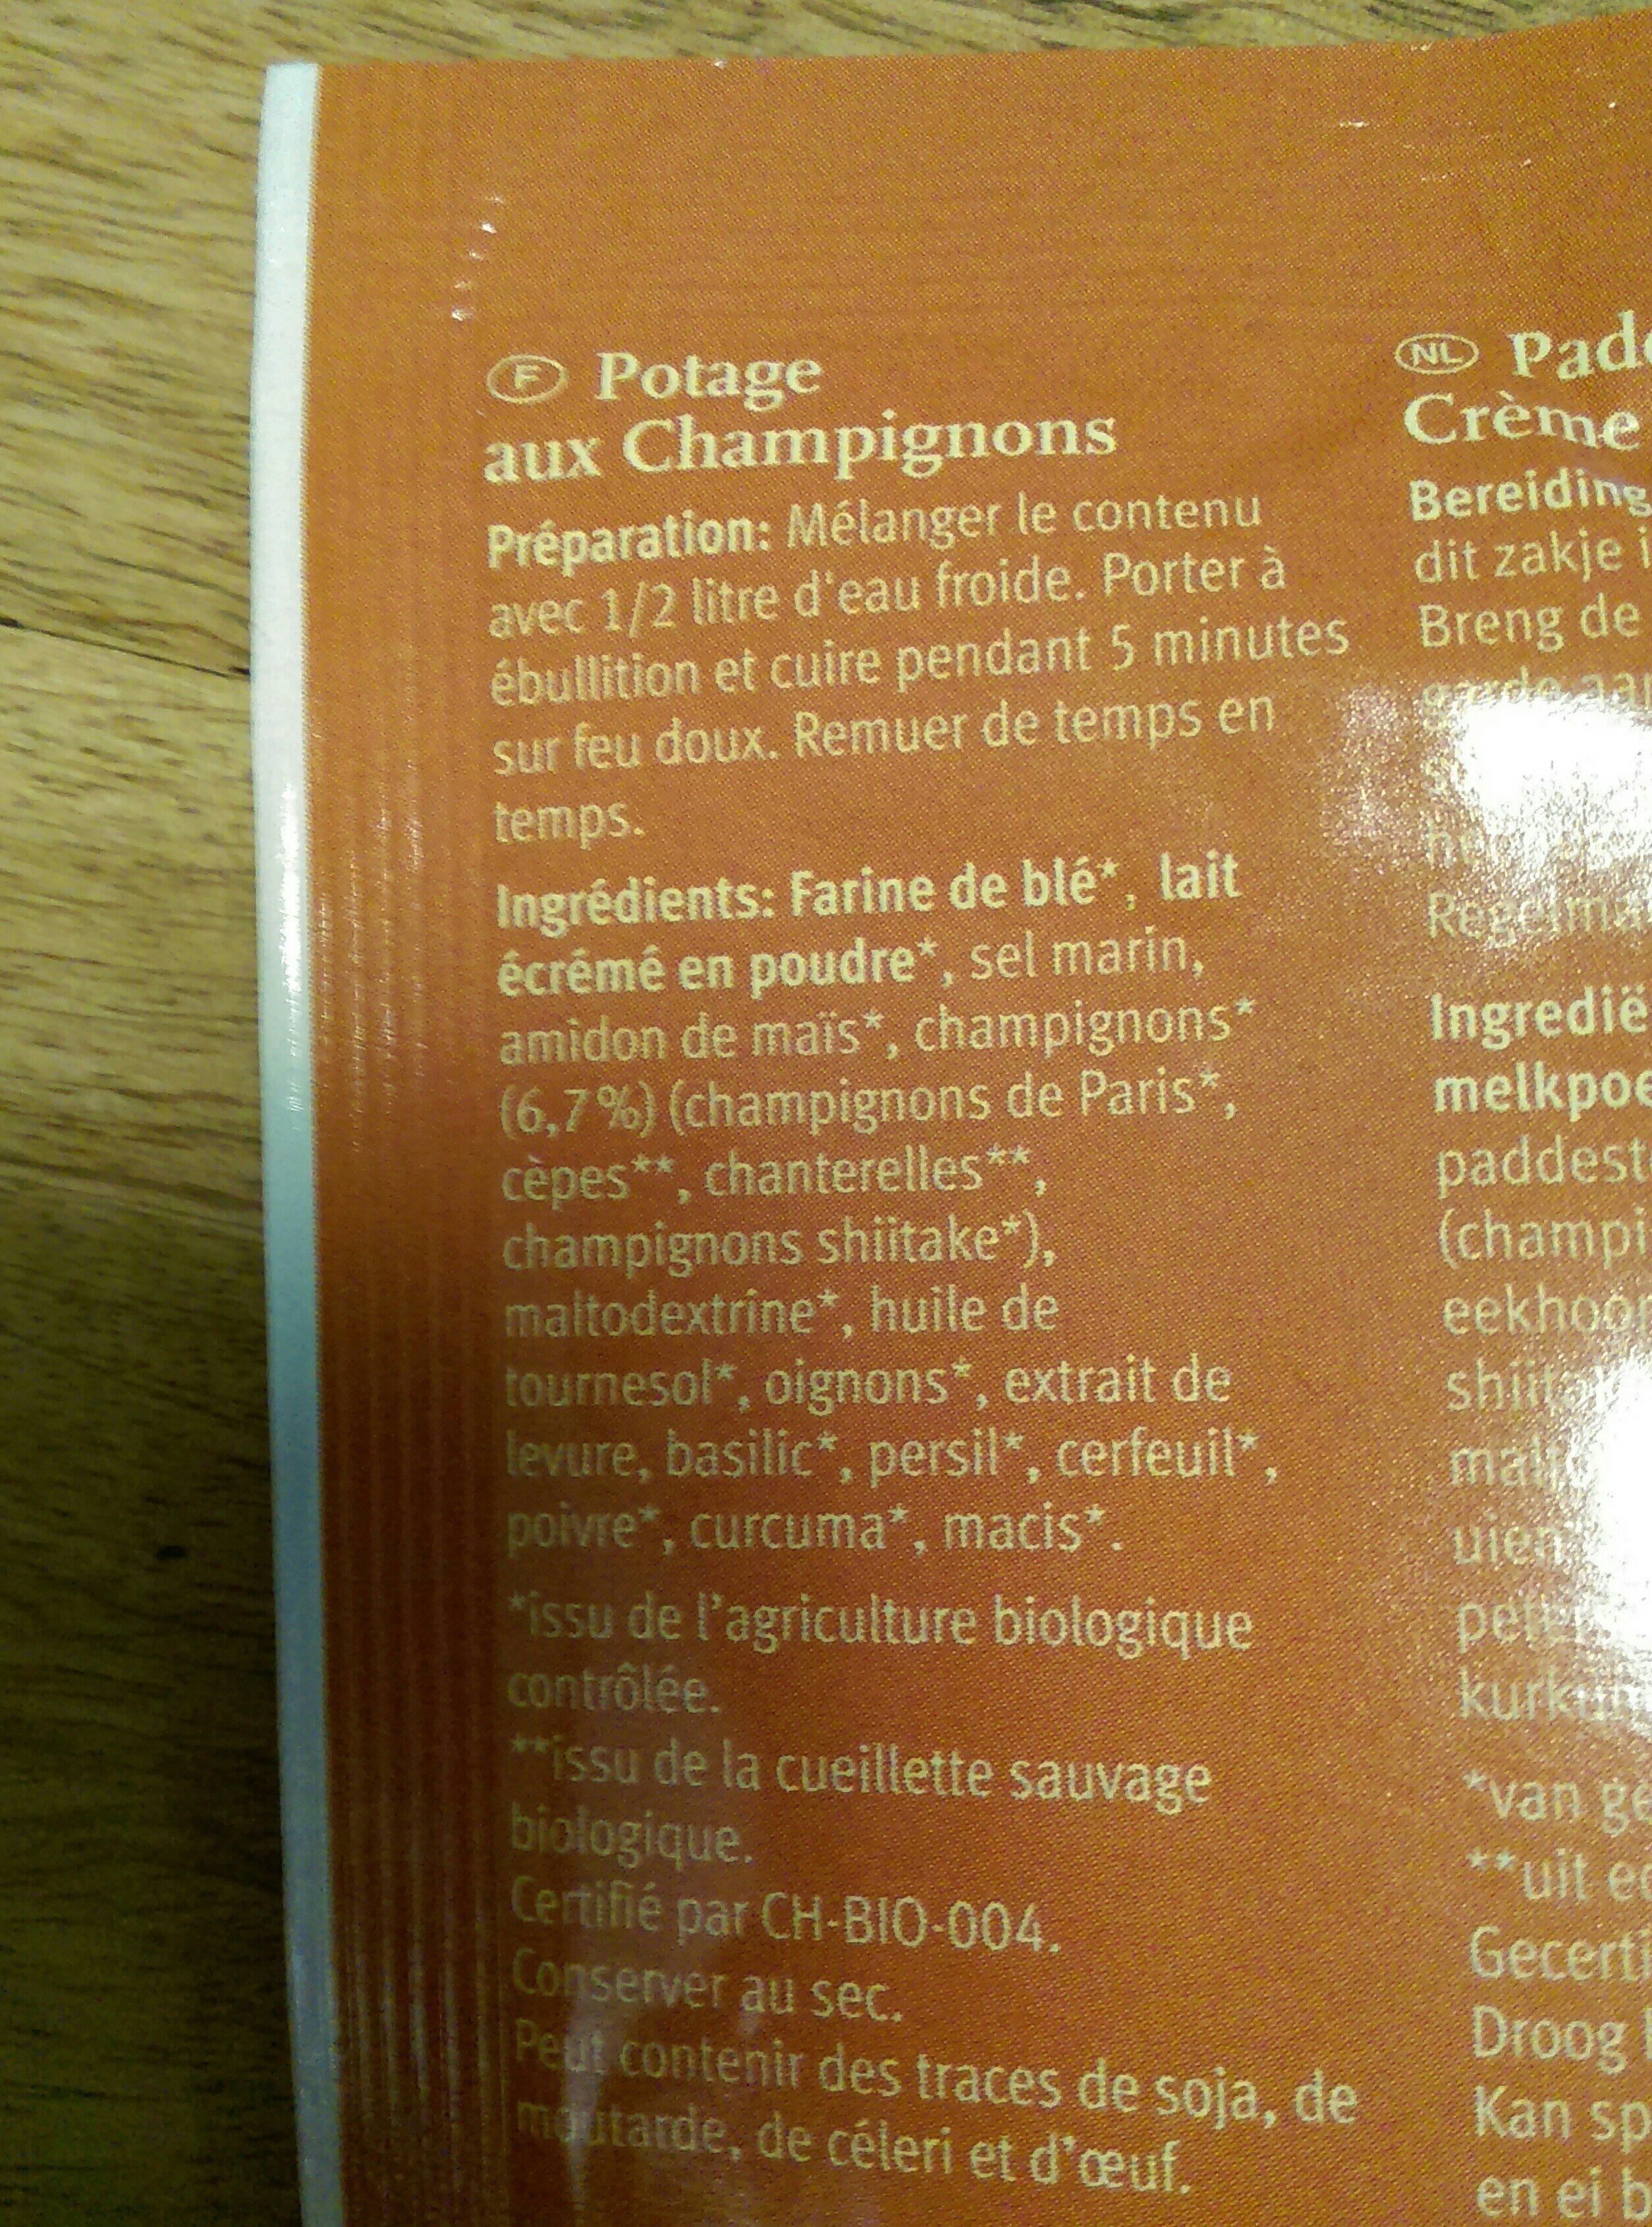 Potage aux champignons - Ingrediënten - fr